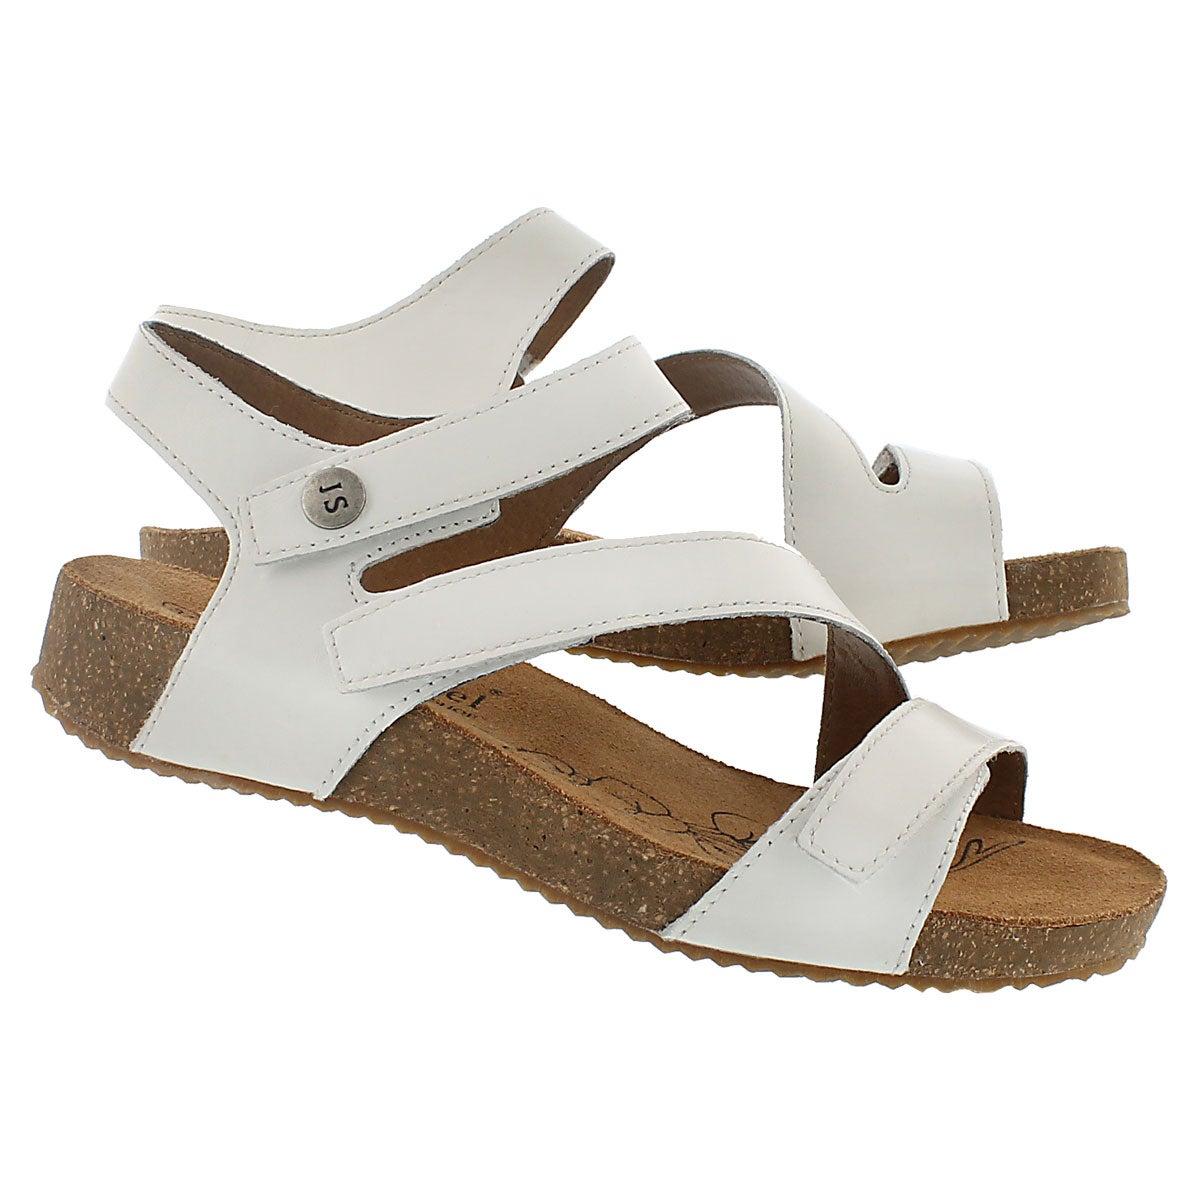 Lds Tonga 25 white casual sandal